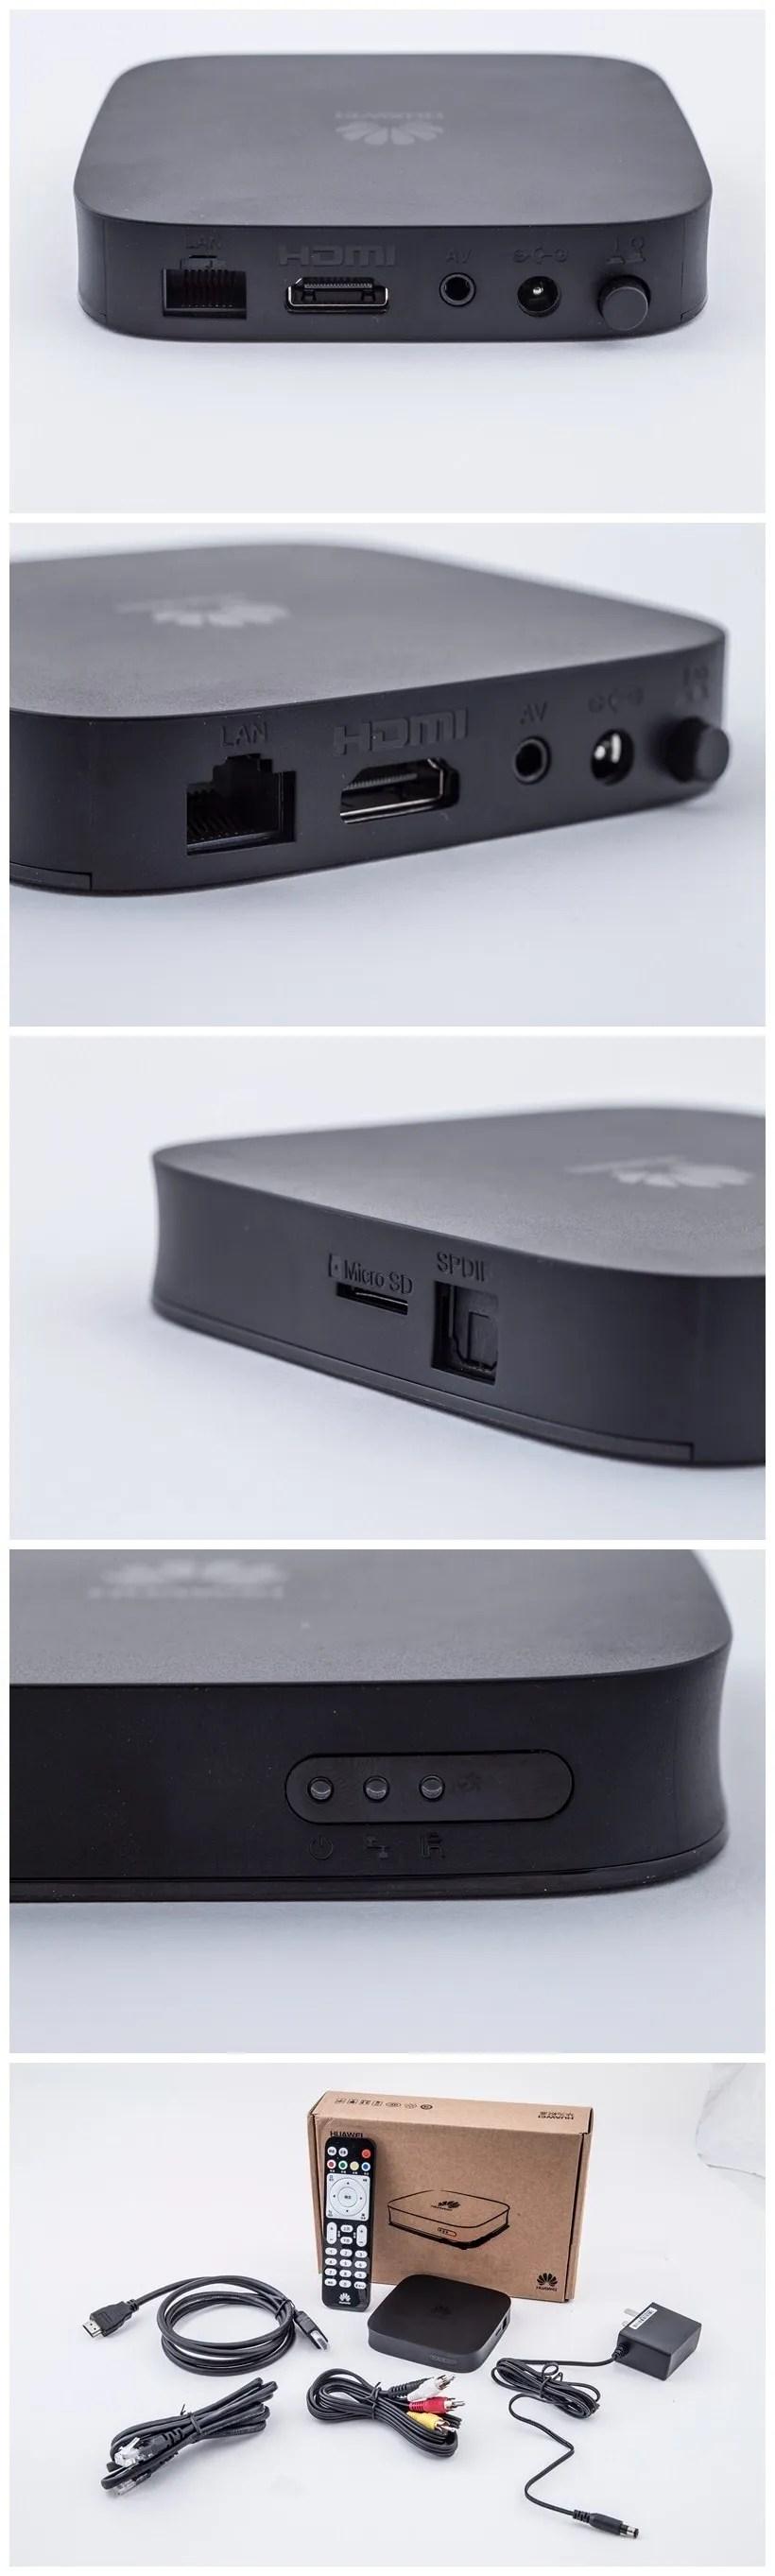 Stb Huawei Ec6108v9 Firmware : huawei, ec6108v9, firmware, Antenna, Design, Ec6108v9, Box,Set, Wifi,Iptv, Product, Alibaba.com